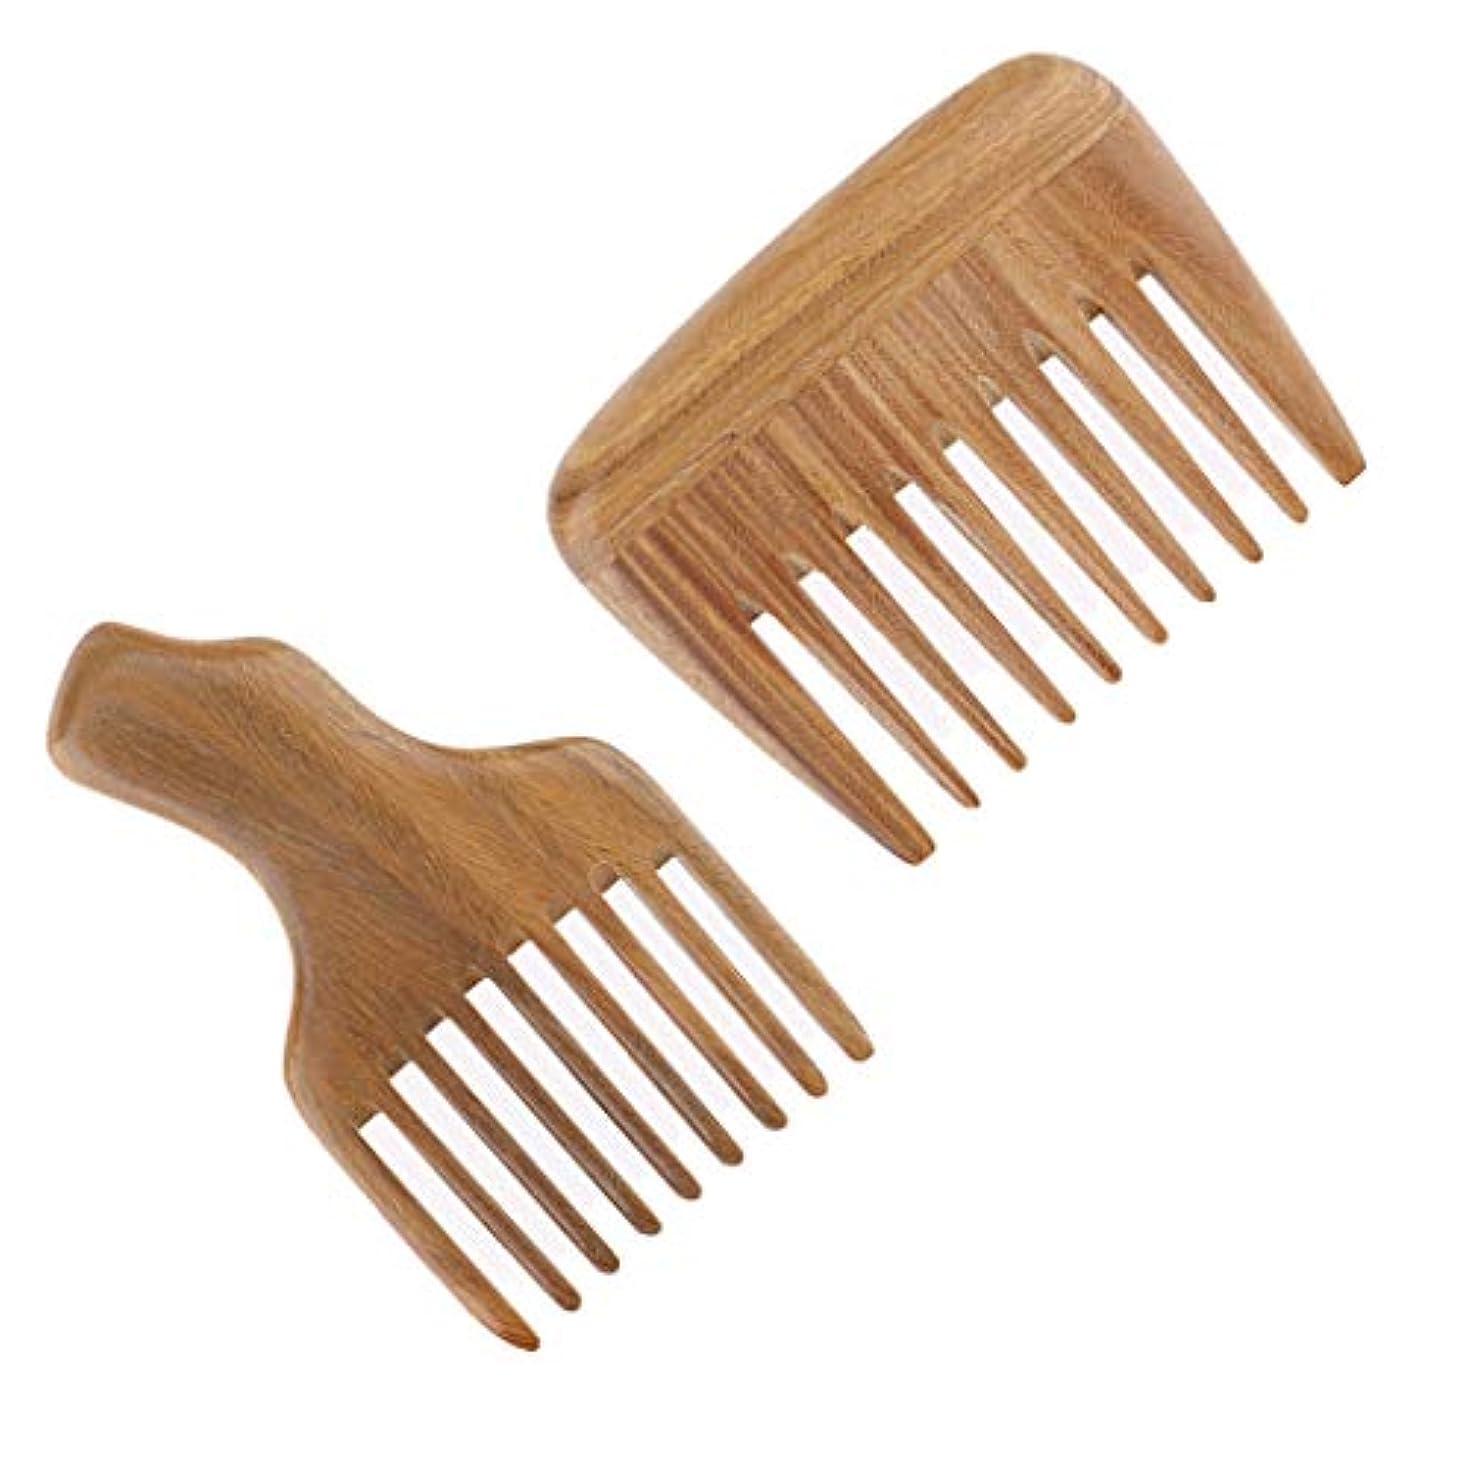 T TOOYFUL 木製コーム ヘアブラシ ヘアコーム 粗い櫛 ユニセックス 理髪店 サロン アクセサリー 2個入り